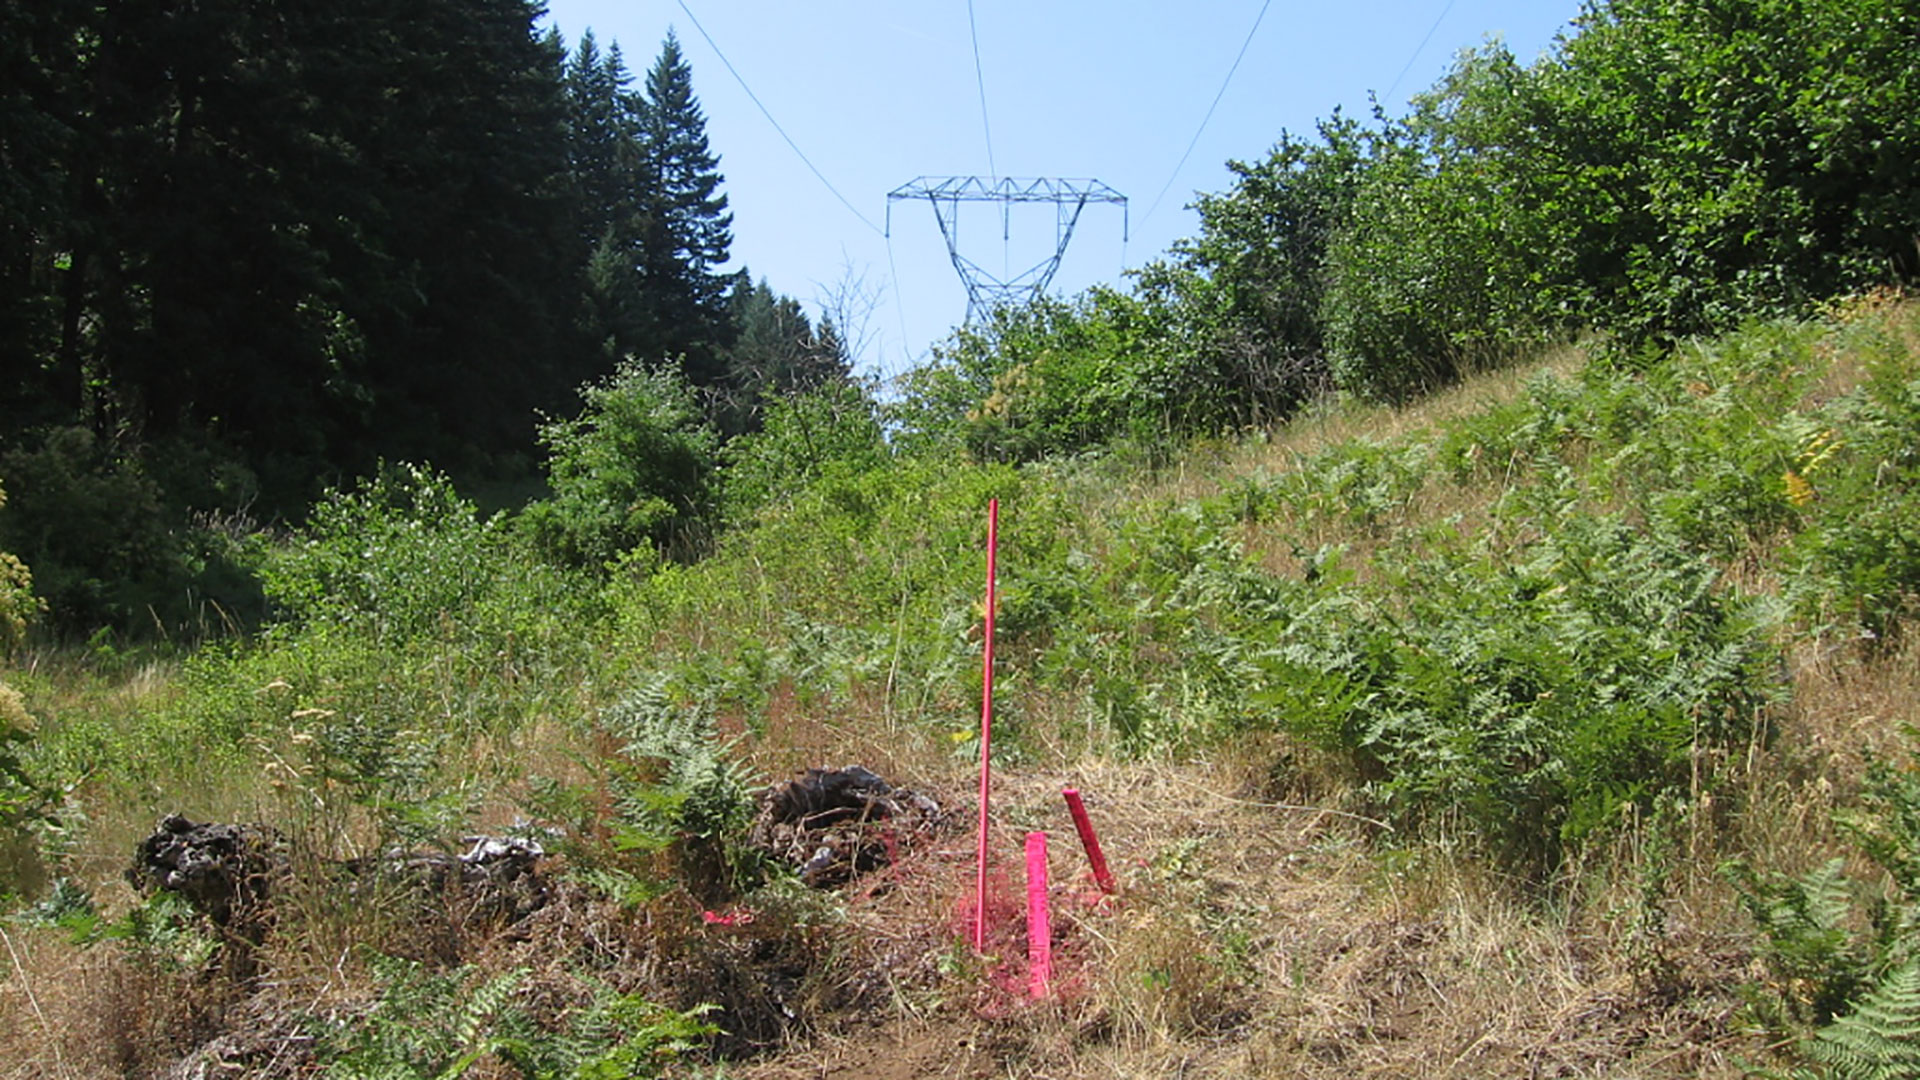 Ross-Schultz Fiber Optic - survey